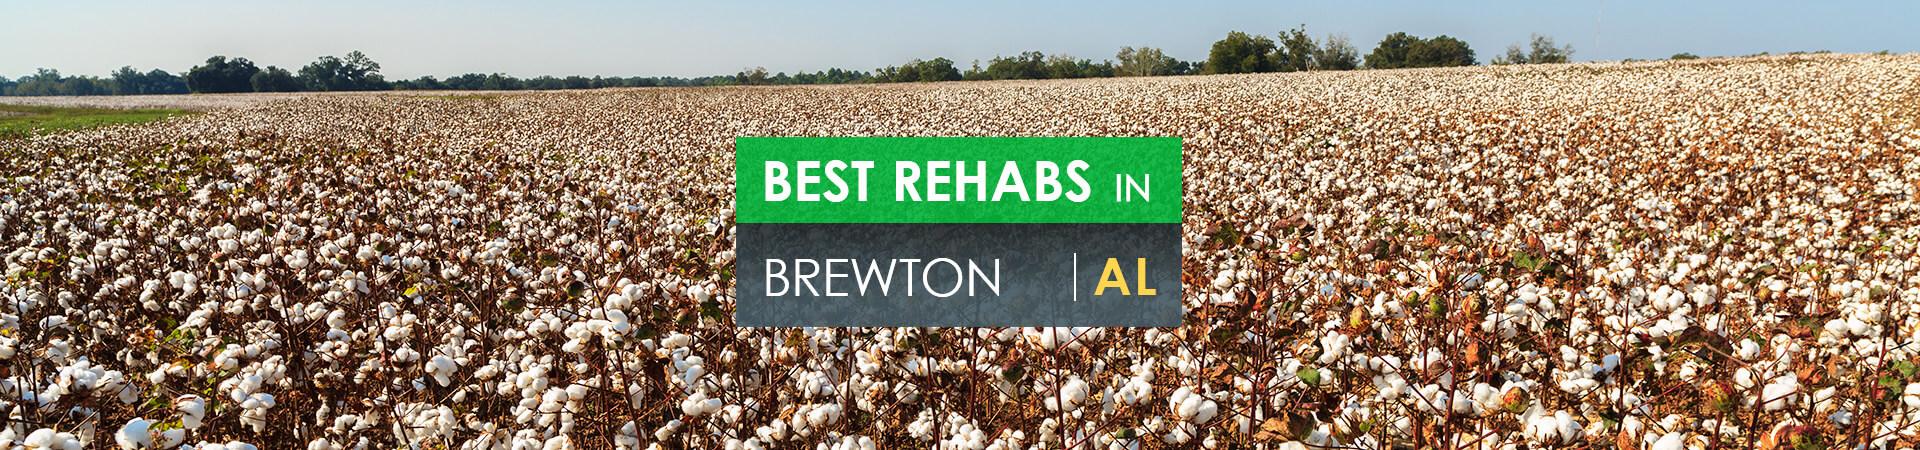 Best rehabs in Brewton, AL